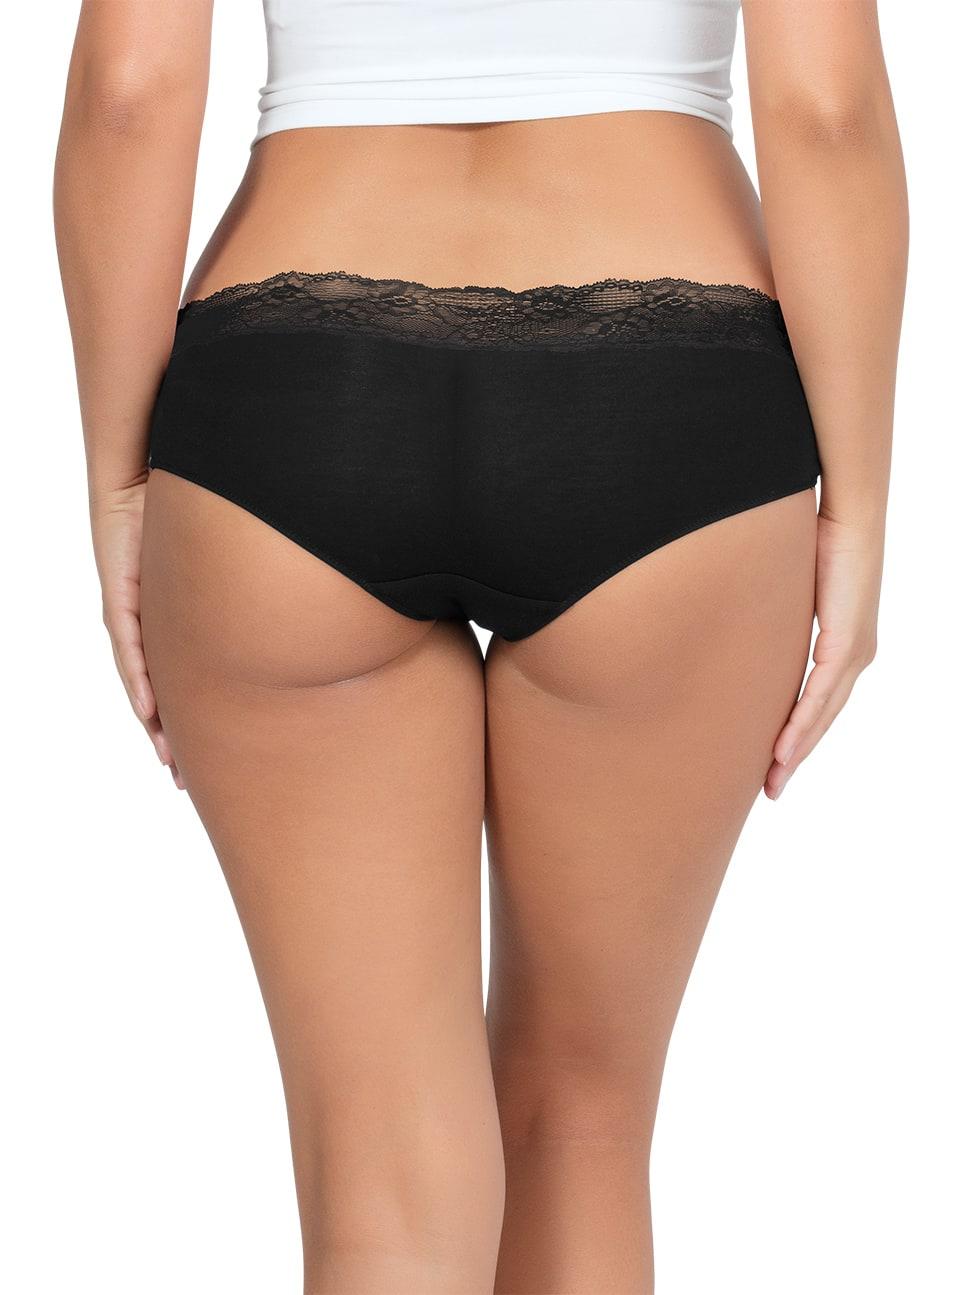 PARFAIT ParfaitPanty SoEssential HipsterPP503 Black Back - Parfait Panty So Essential Hipster - Black - PP503